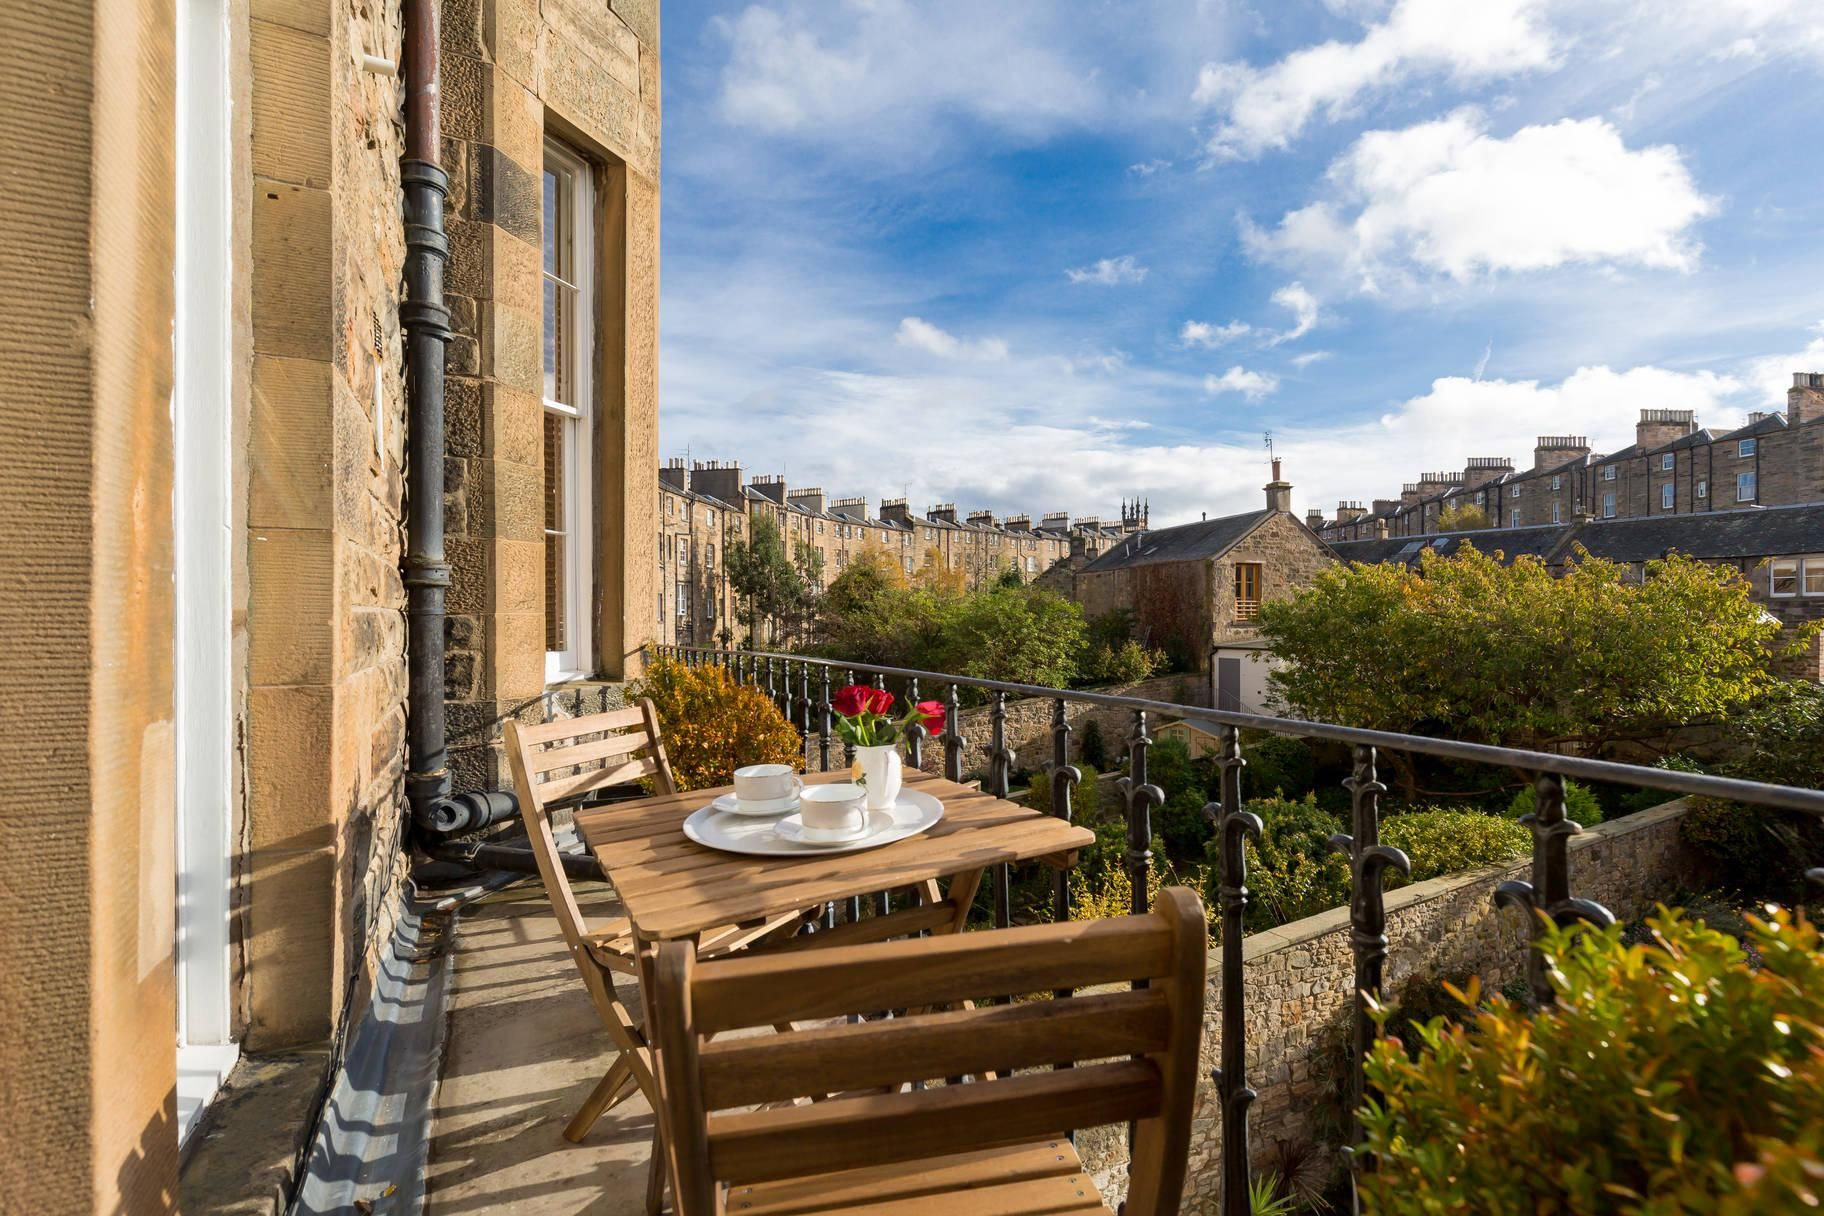 23/1 Buckingham Terrace, West End - Photo 12